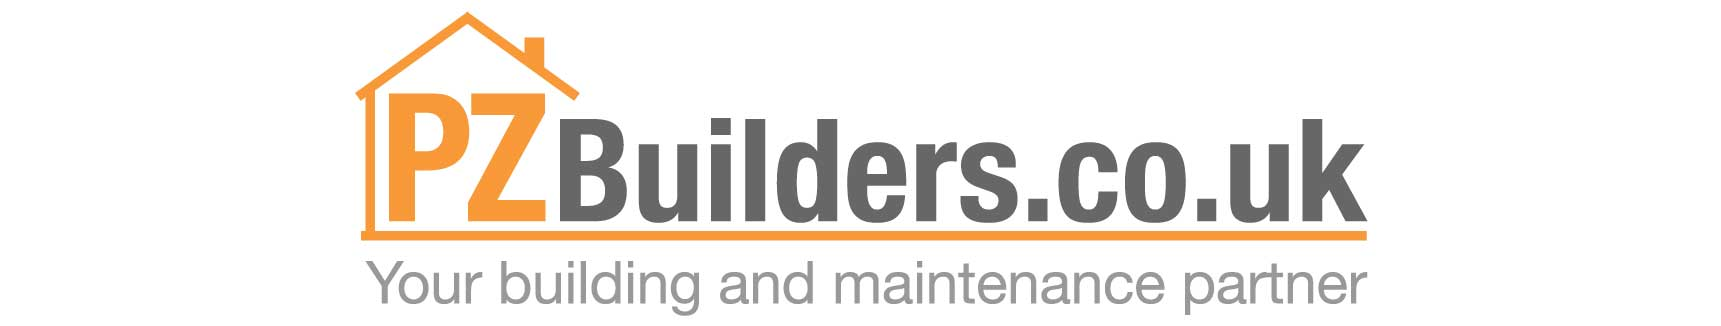 https://www.pzbuilders.co.uk/website/wp-content/uploads/New-PZ-header-logo-mobile-1.jpg